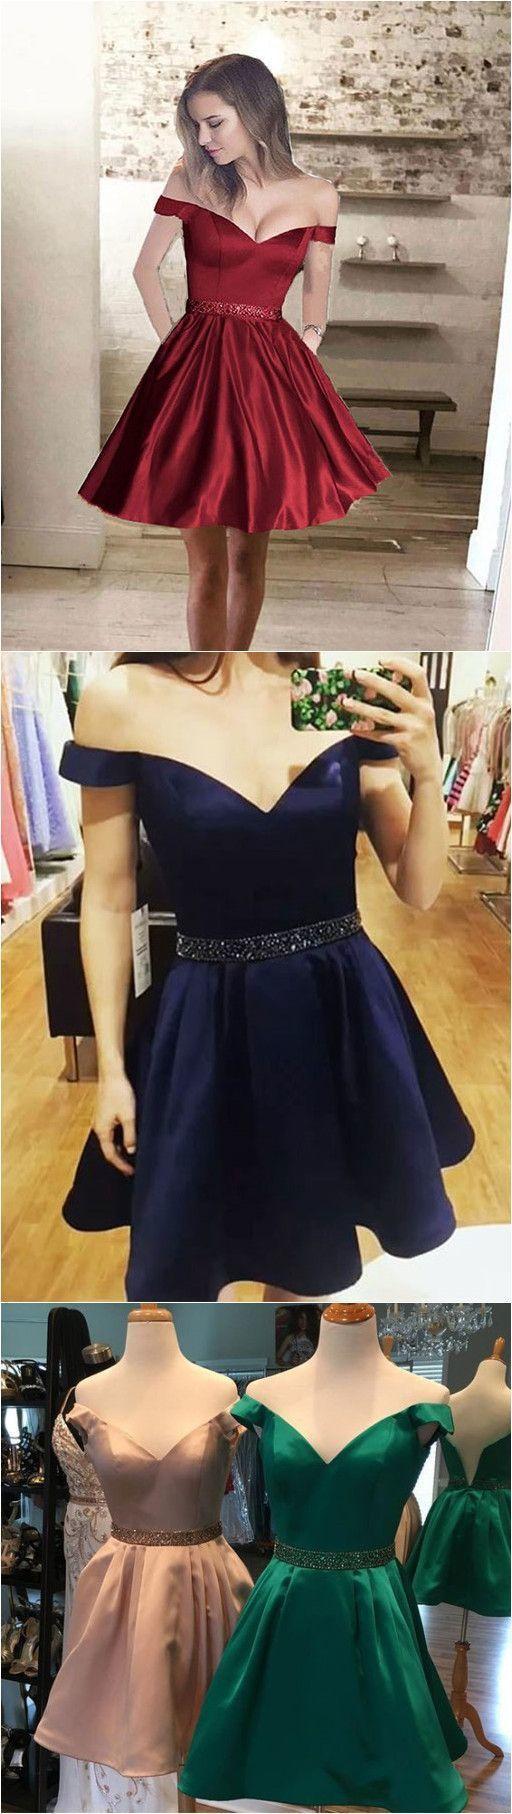 V neck off shoulder prom dress short homecoming dress beaded sashes